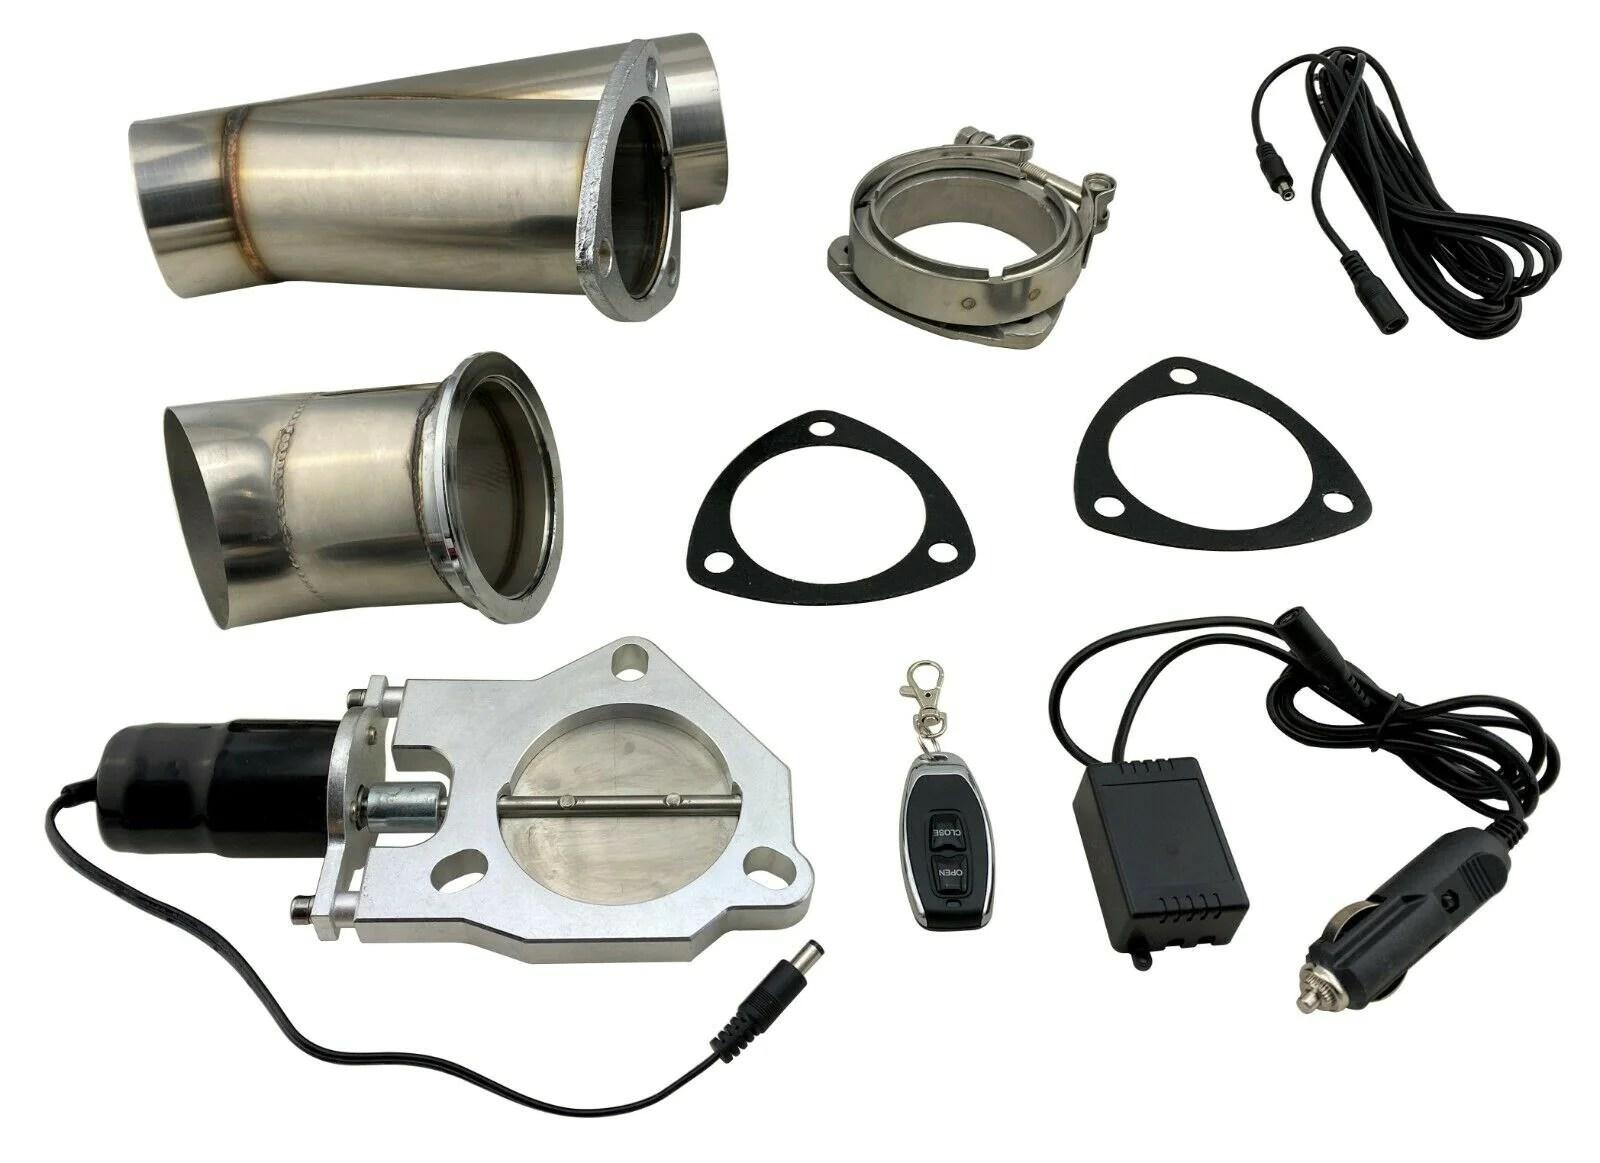 3 hiflow electric exhaust muffler valve cutout system dump wireless remote fob